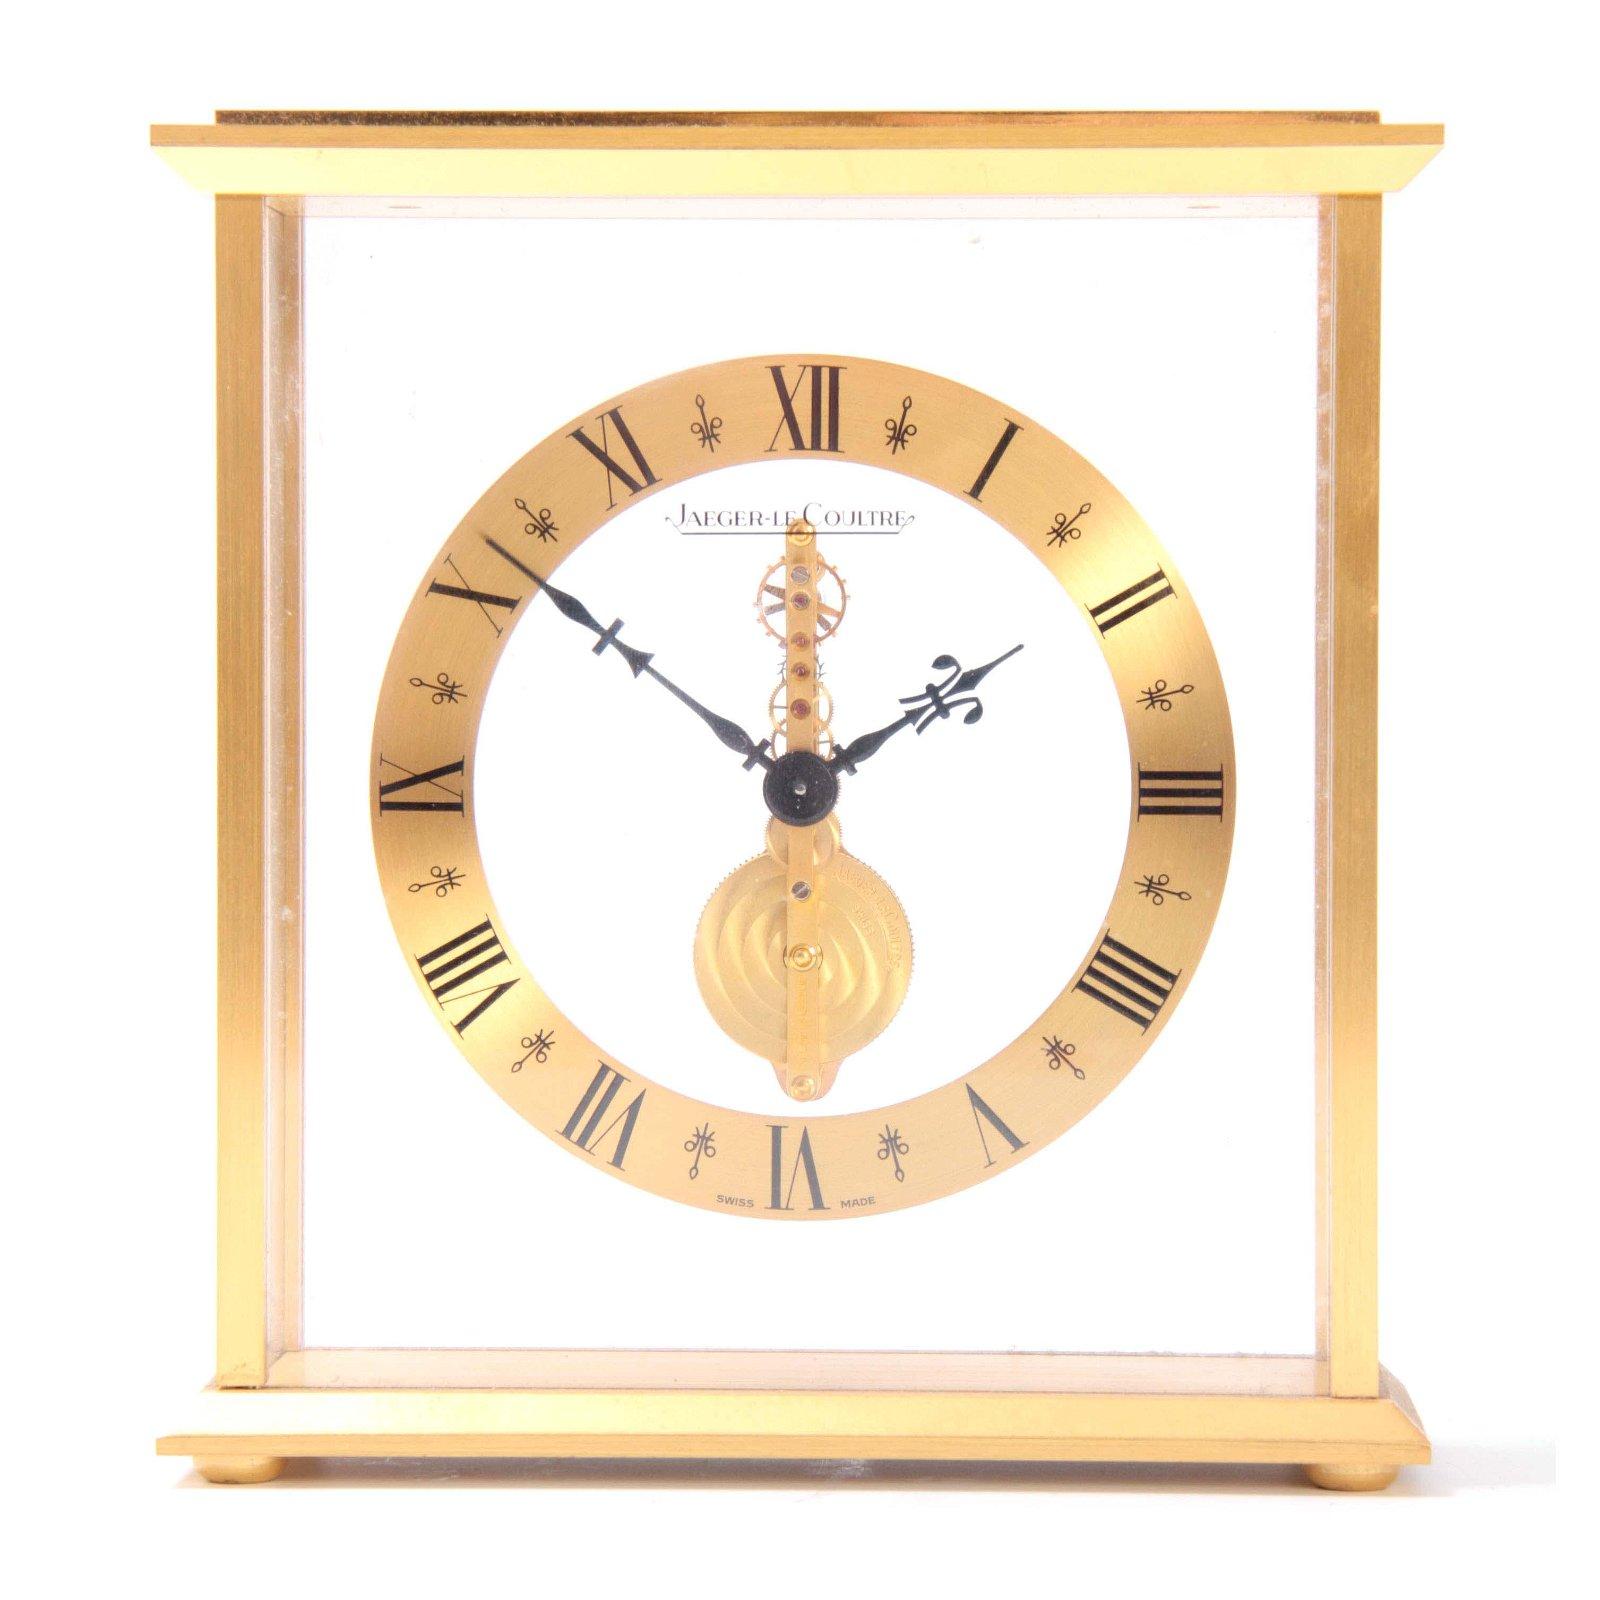 A MID 20TH CENTURY JAEGER-LECOULTRE MANTEL CLOCK